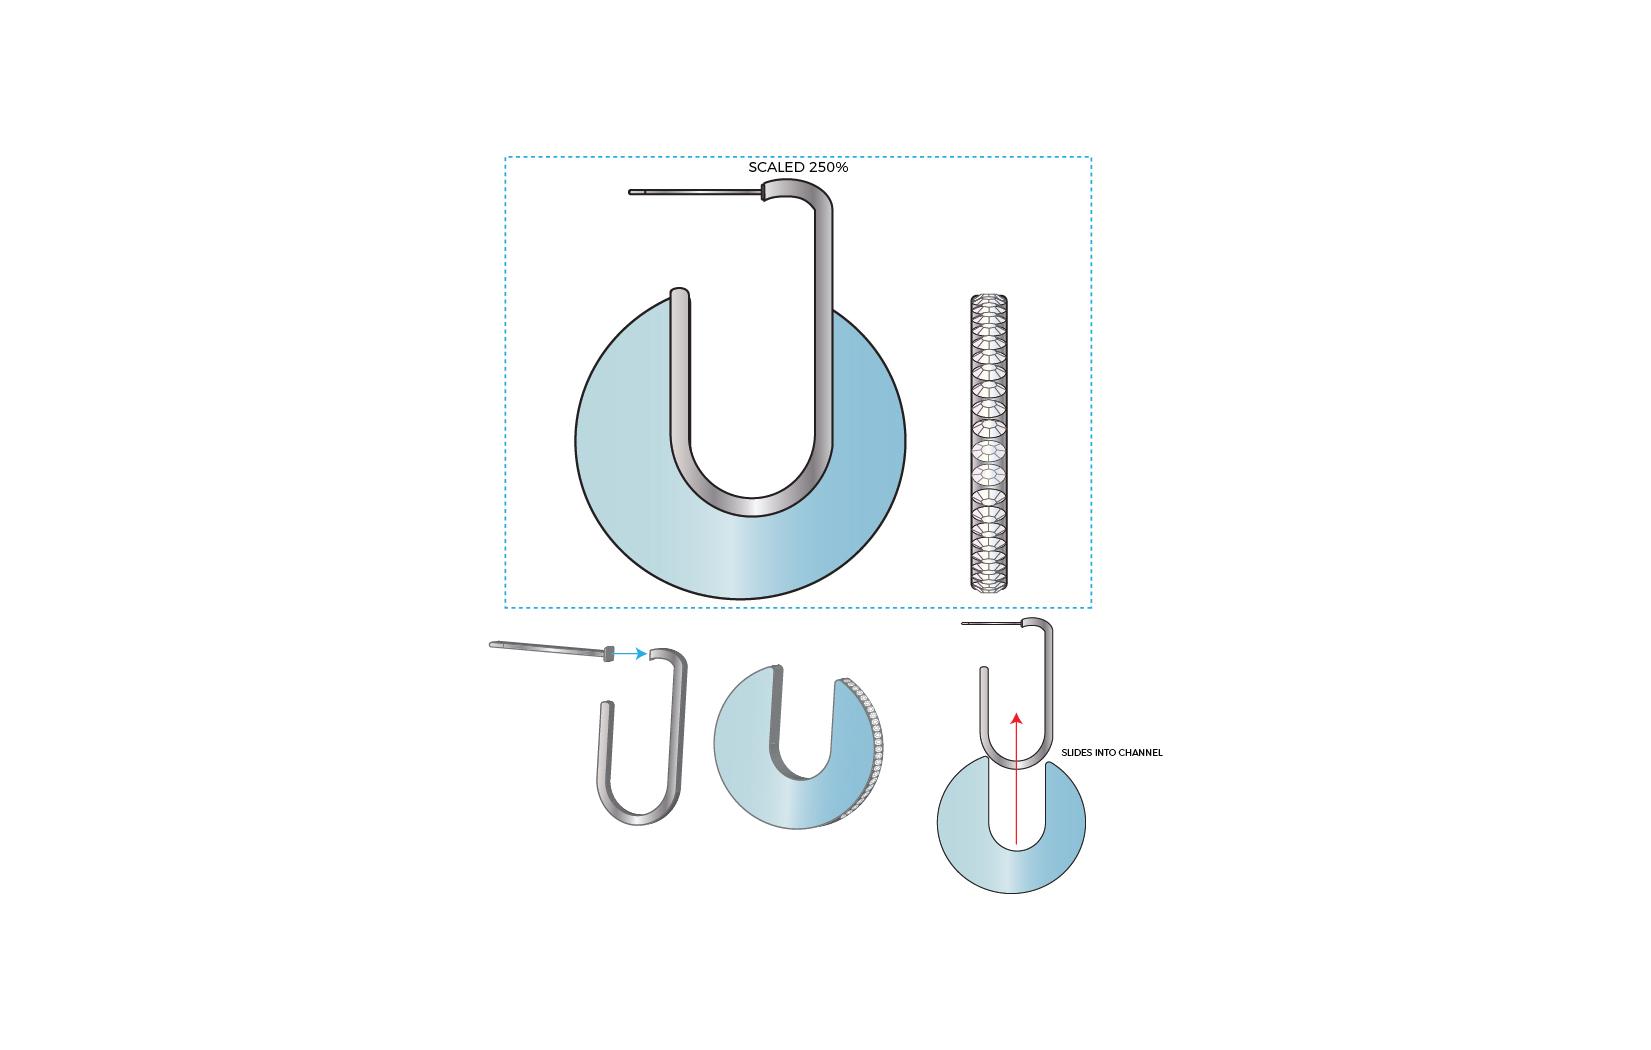 Sliding Earrings Concept A